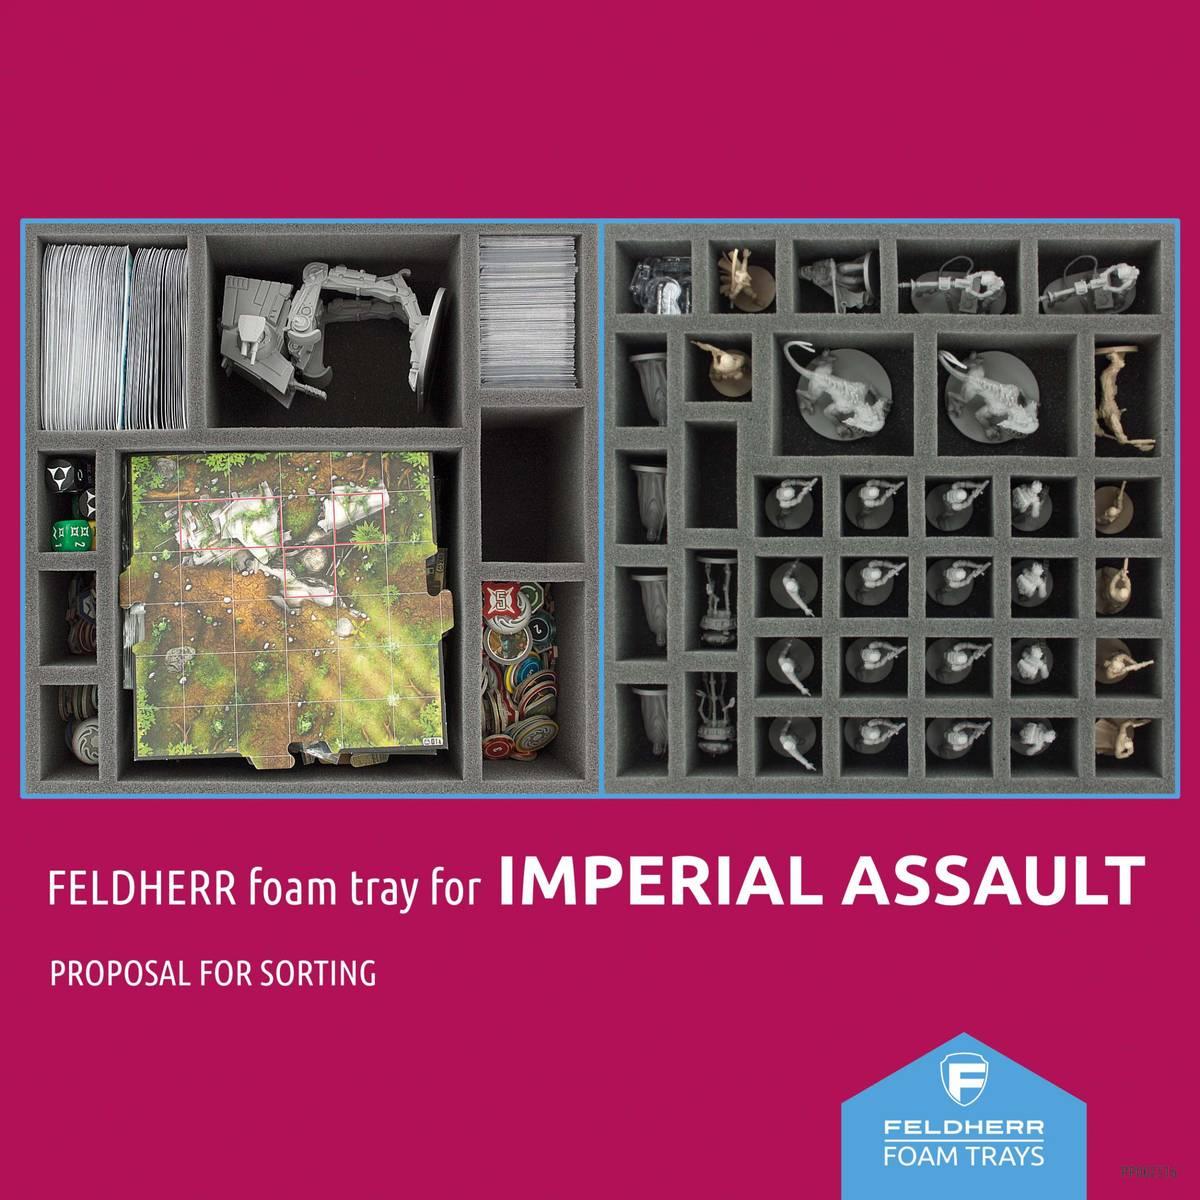 PP002516 - Flyer for Imperial Assault